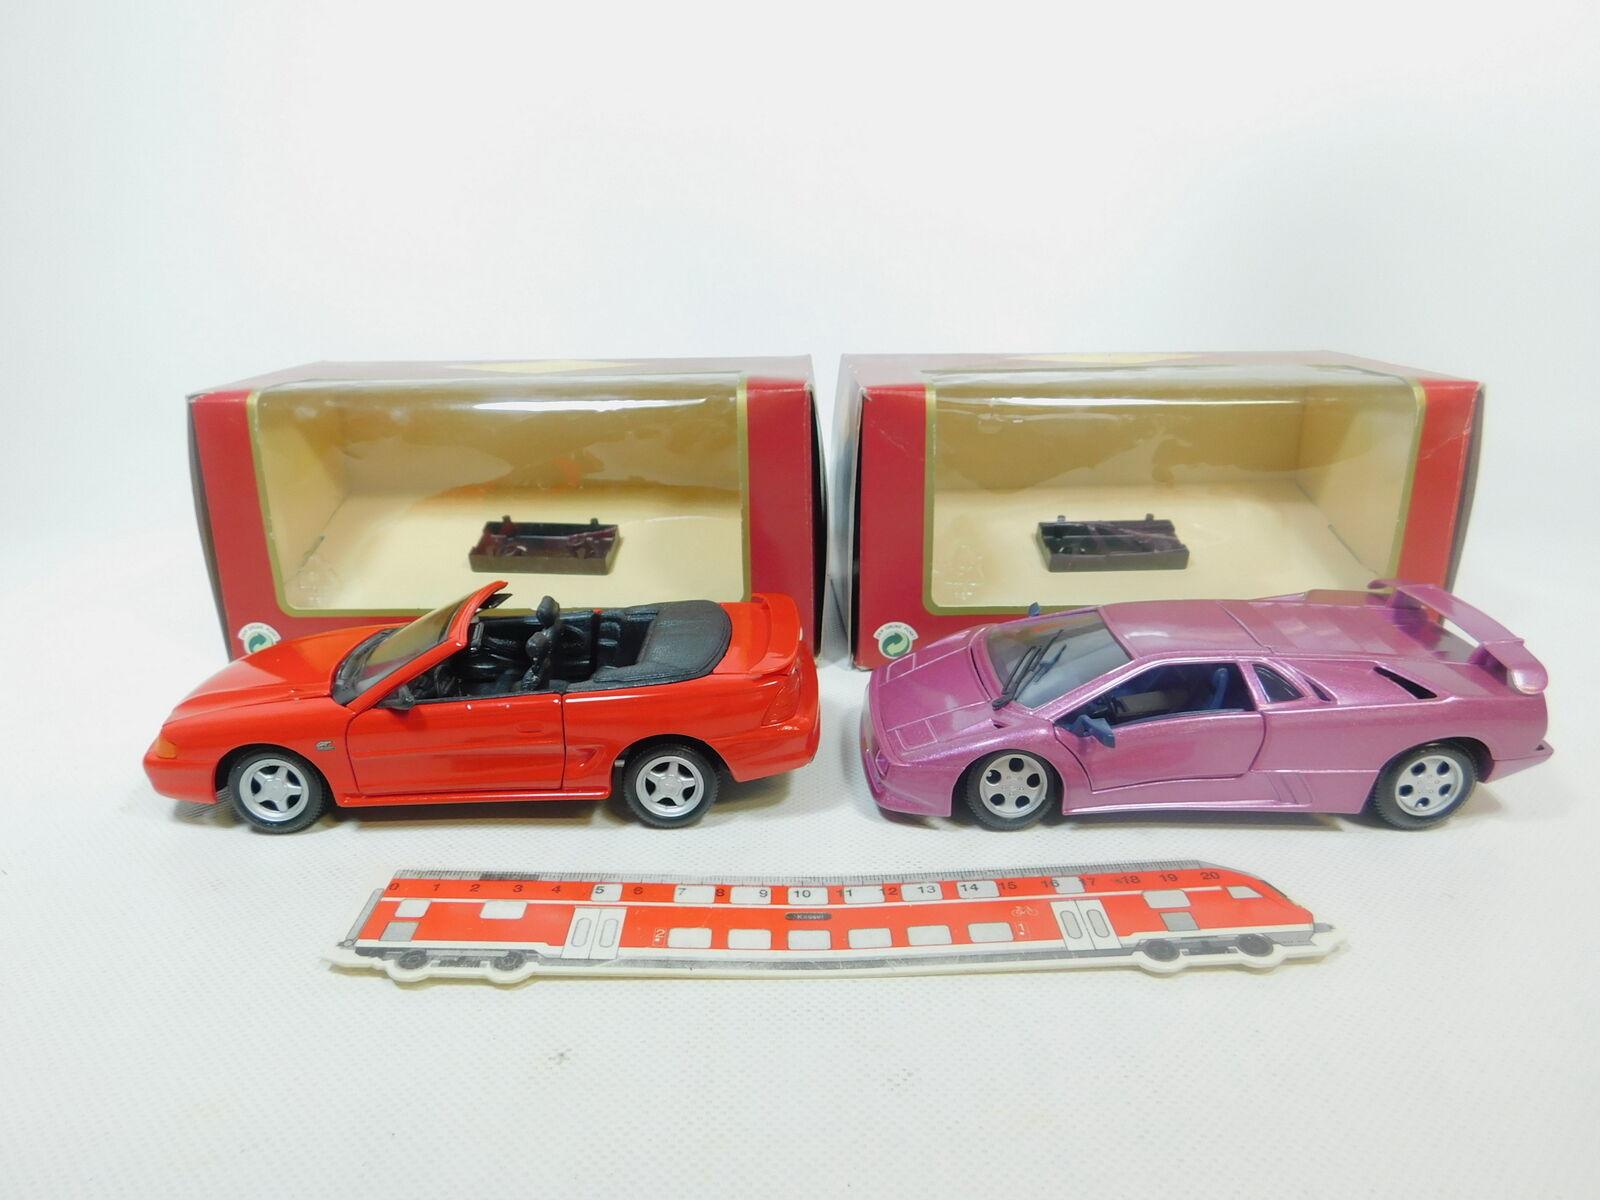 BP462-2  2x Playbear (Maisto) 1 24 Metall-PKW  Lamborghini Lamborghini Lamborghini  '94 Mustang, (OVP) 91b76f